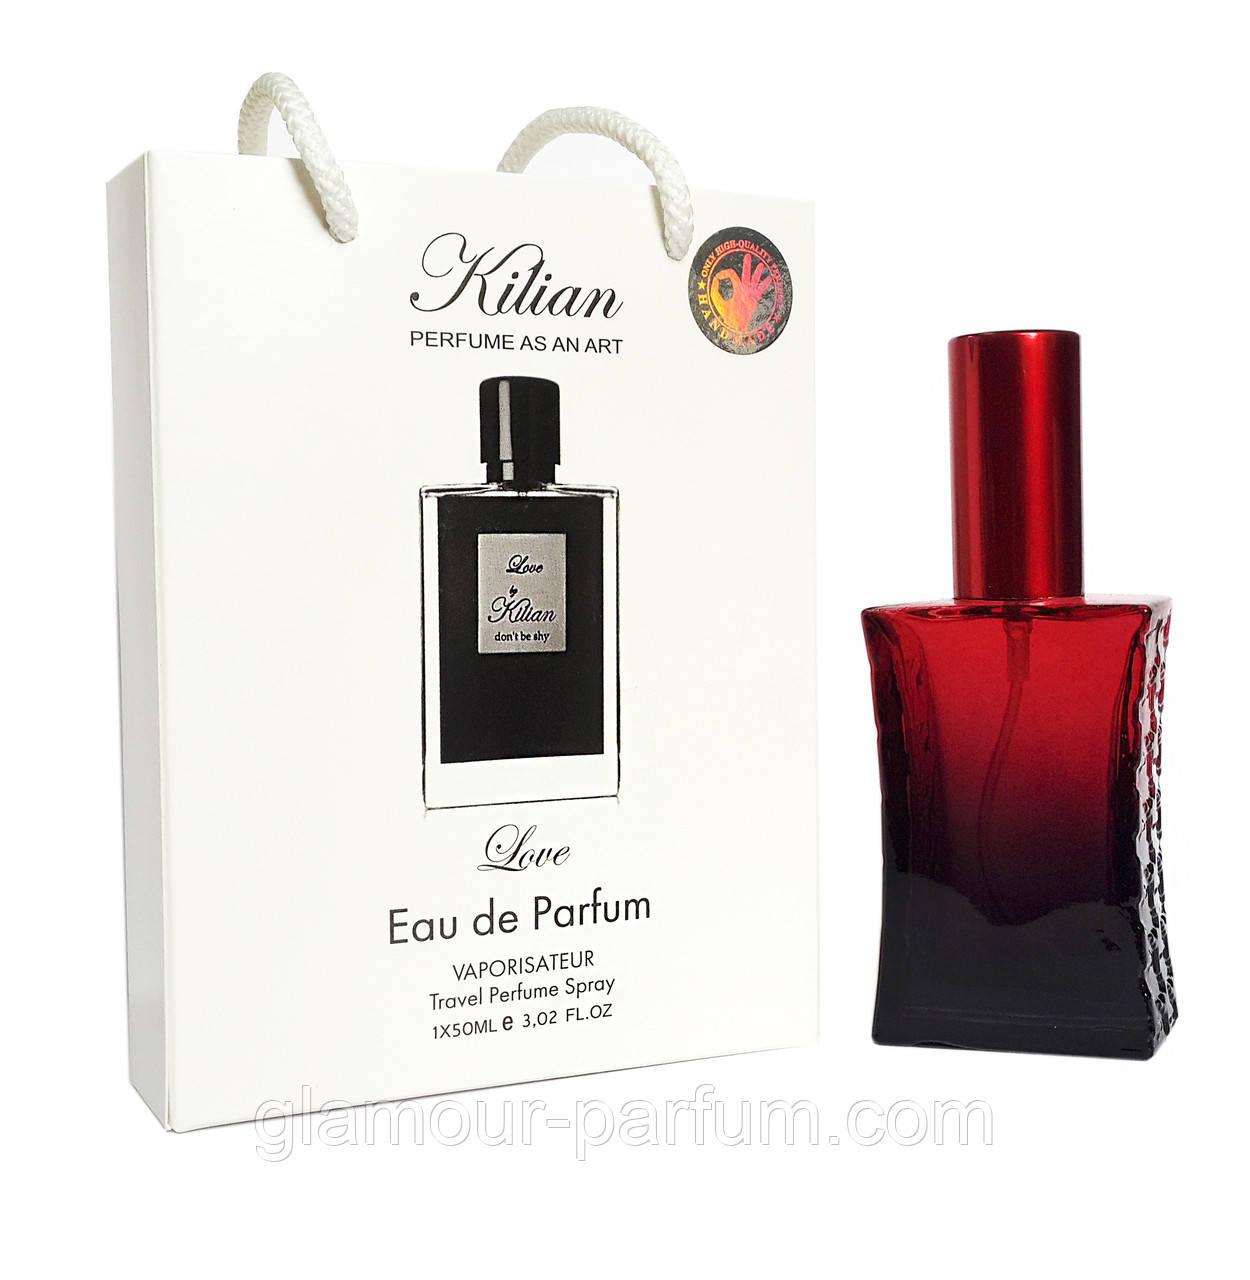 Kilian Love by Kilian (Килиан Лав Бай Килиан) в подарочной упаковке 50 мл. (реплика)